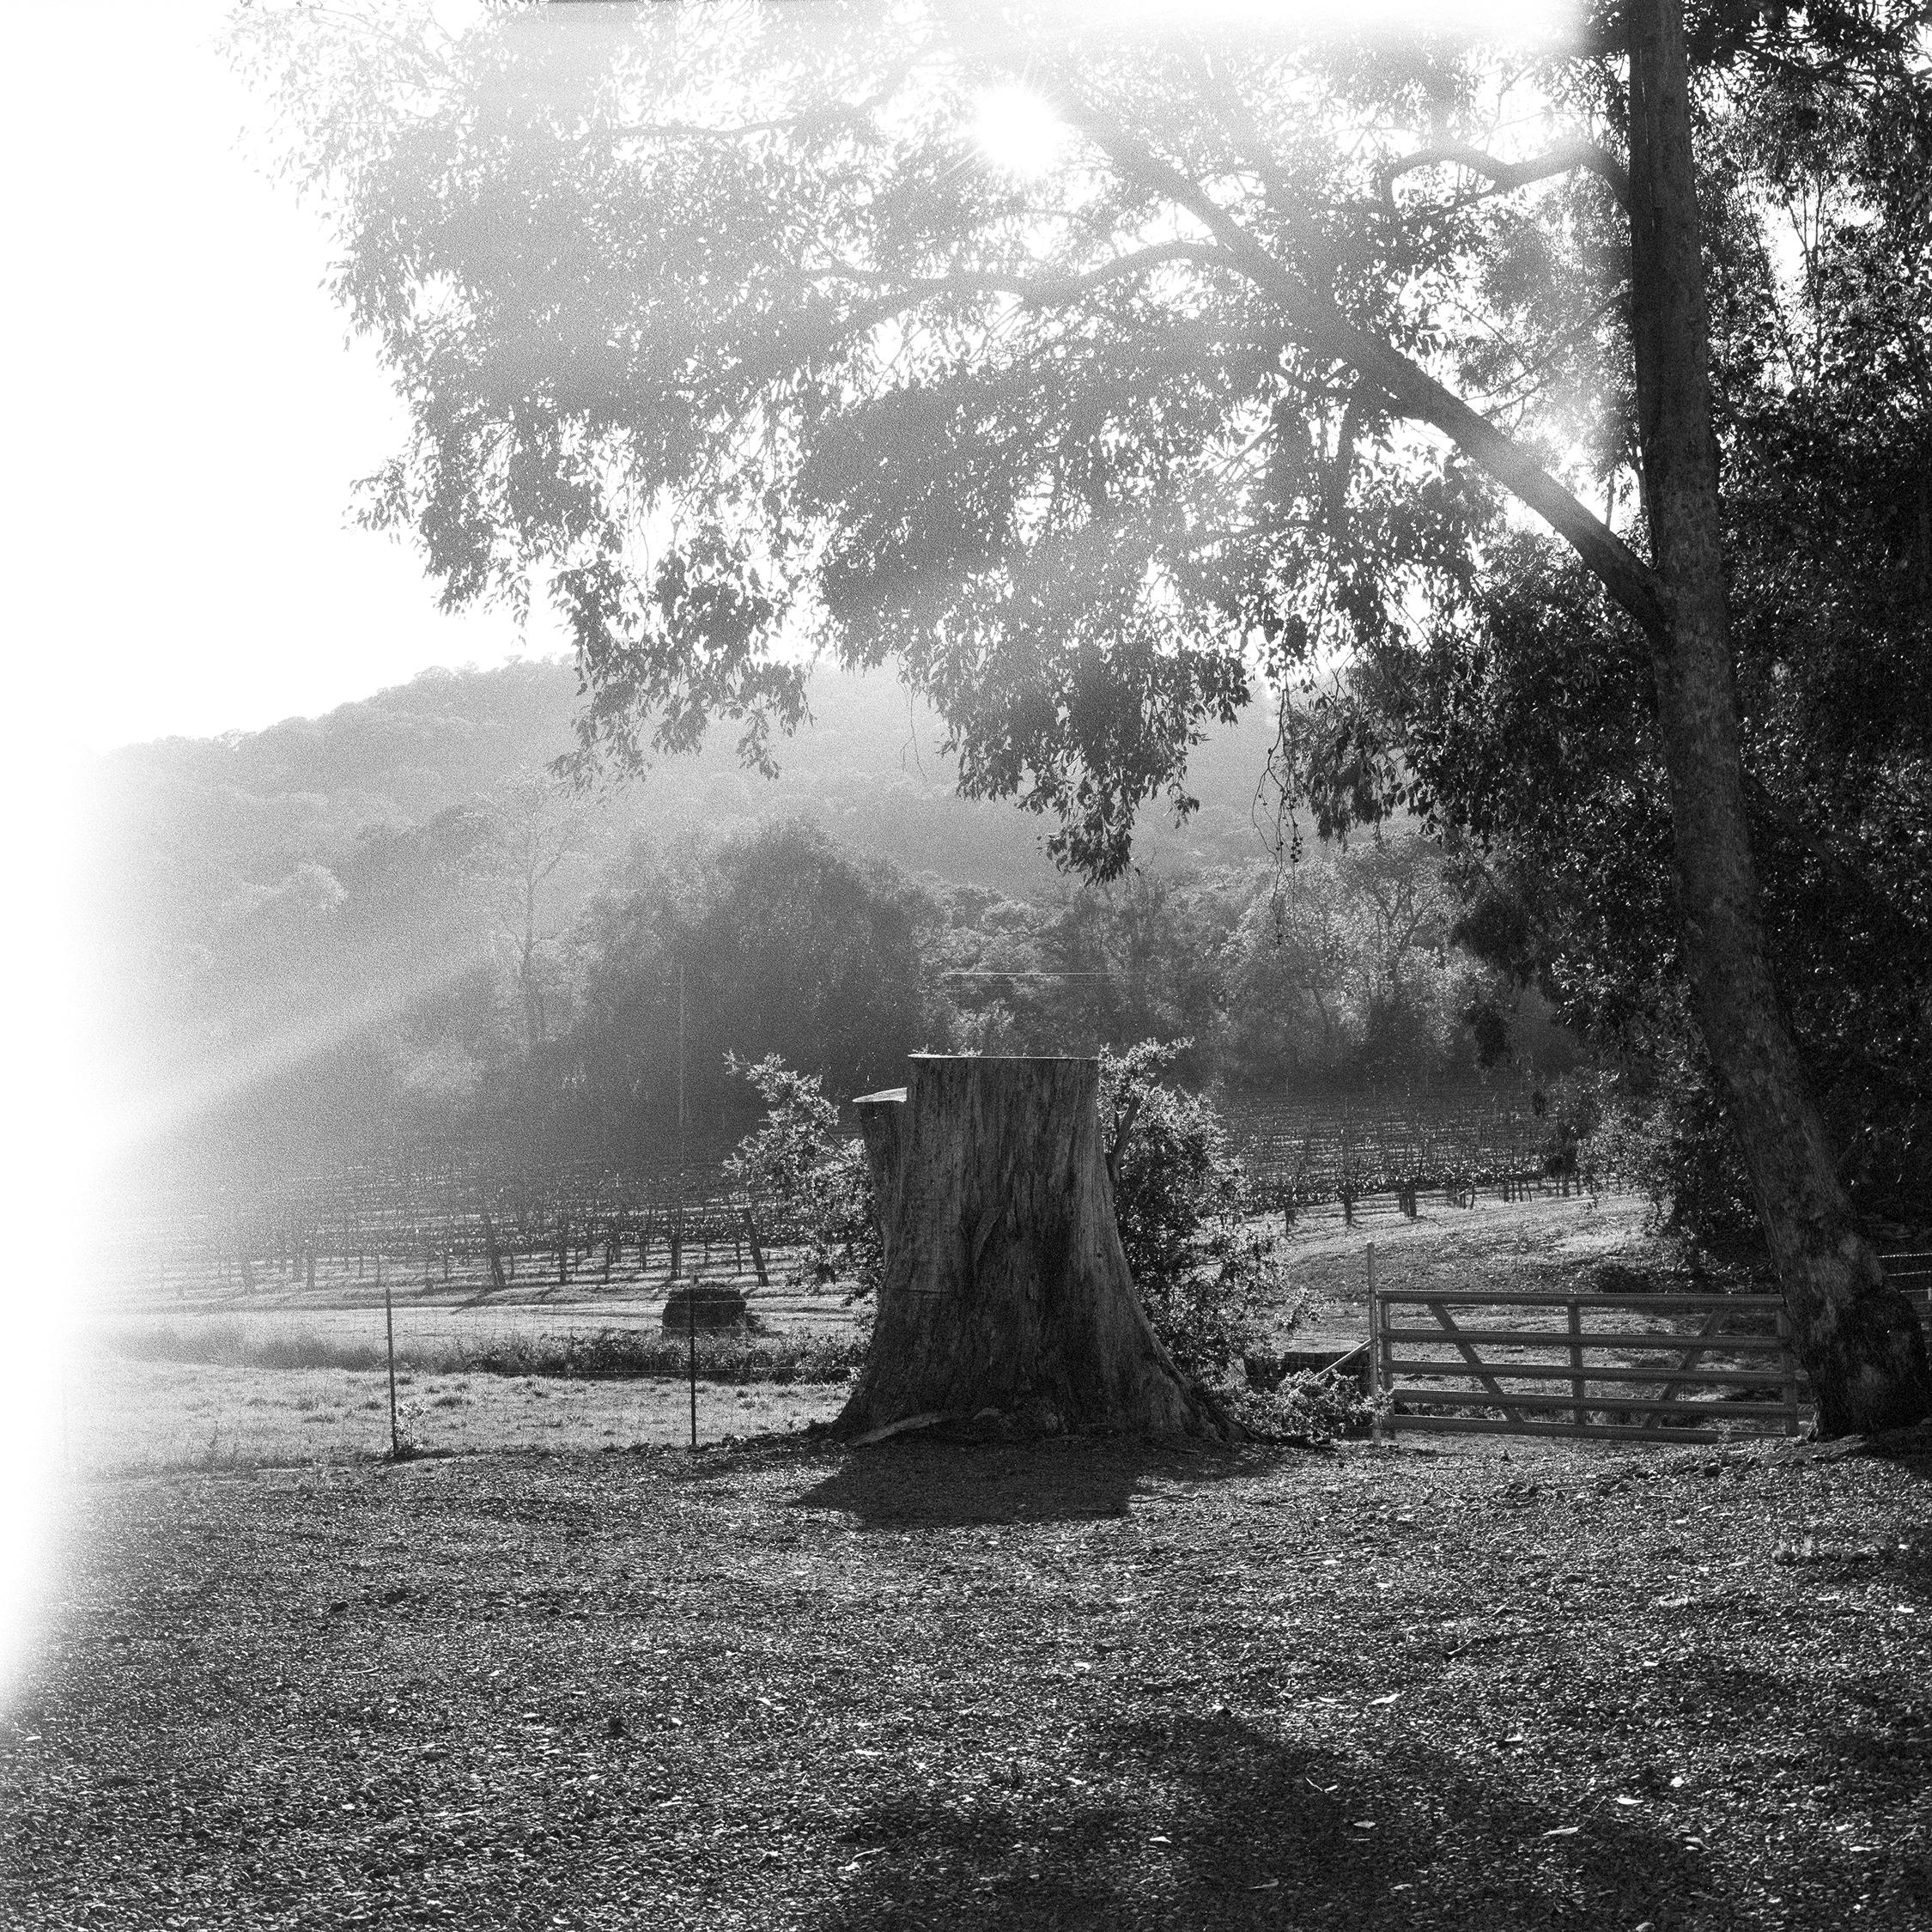 Aldo Carrera x Simon Ungless-3-crop.jpg